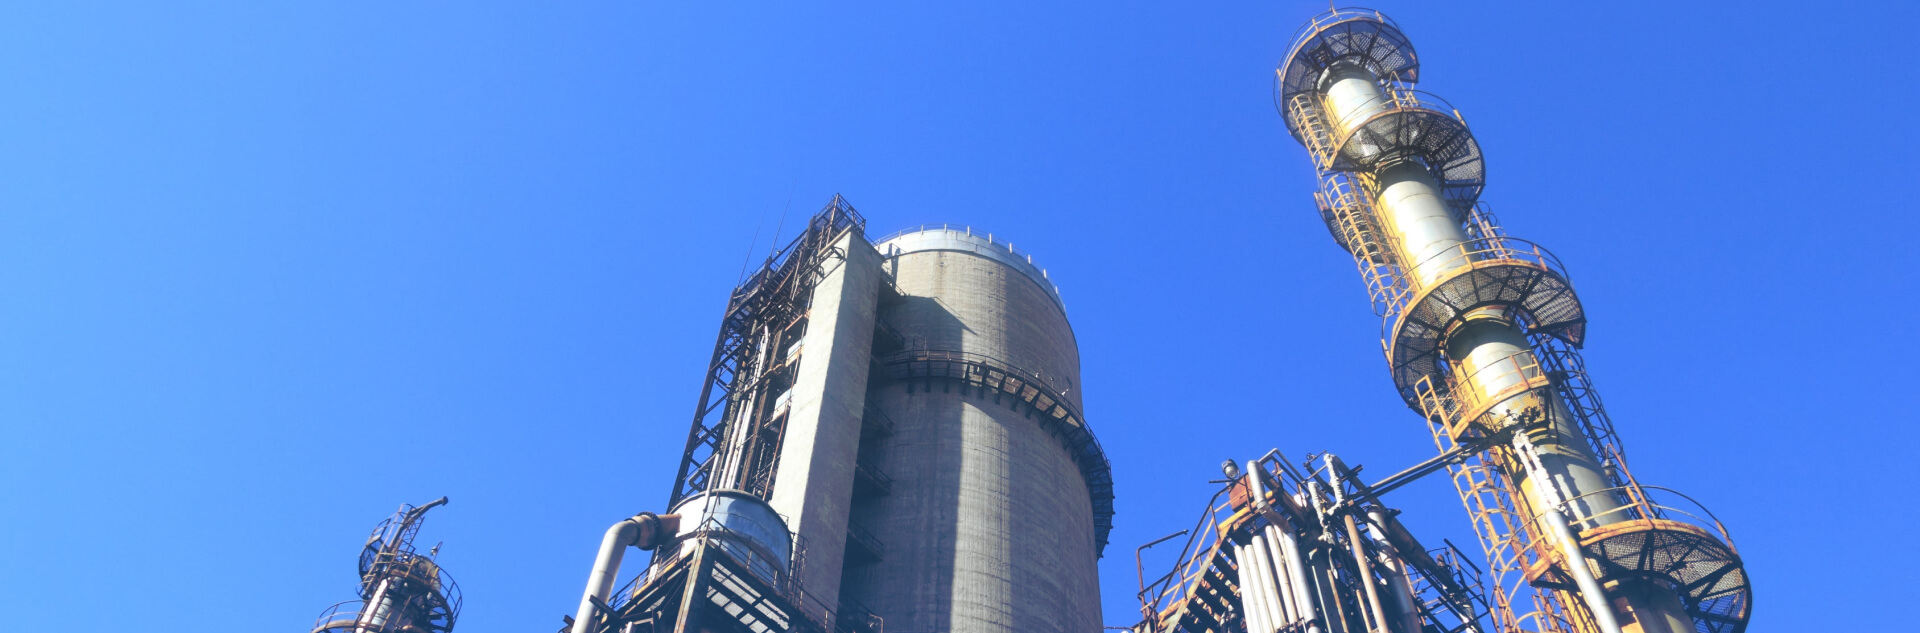 bg factory